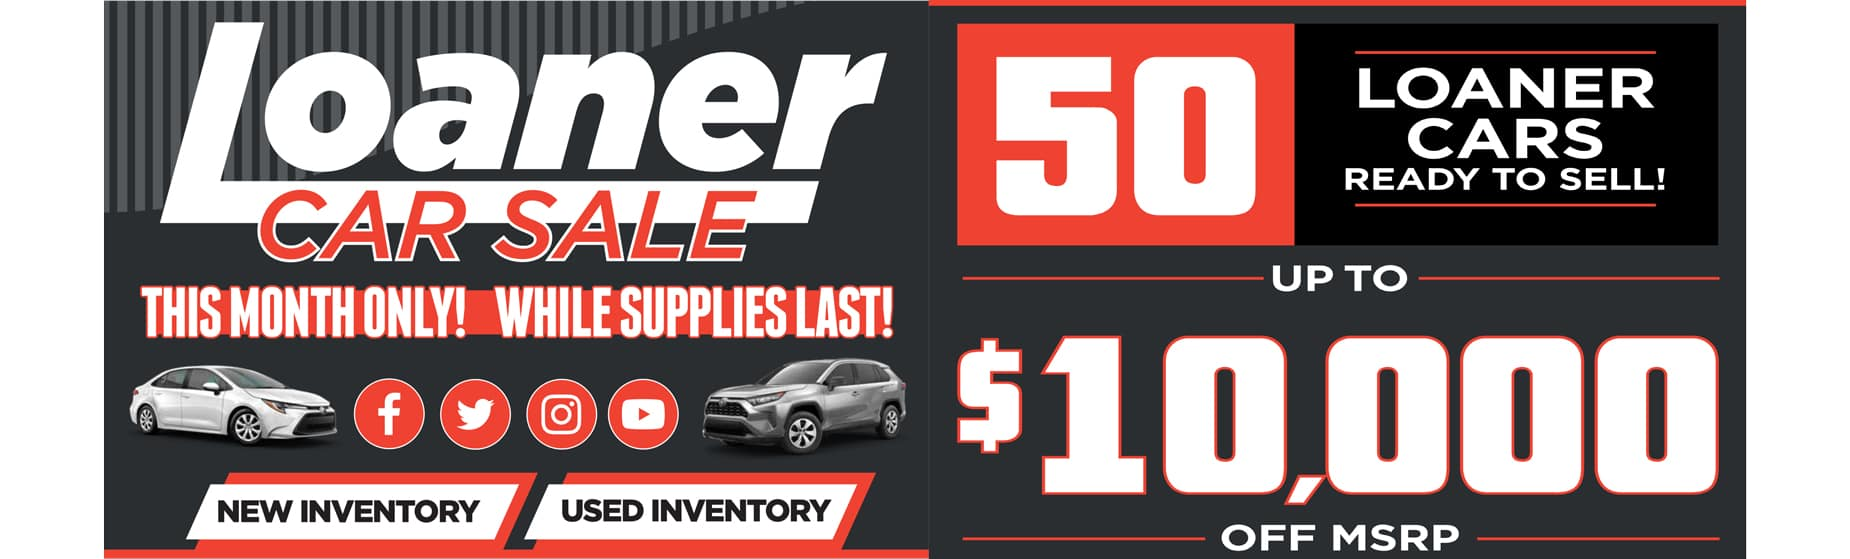 Loaner-Car-sale